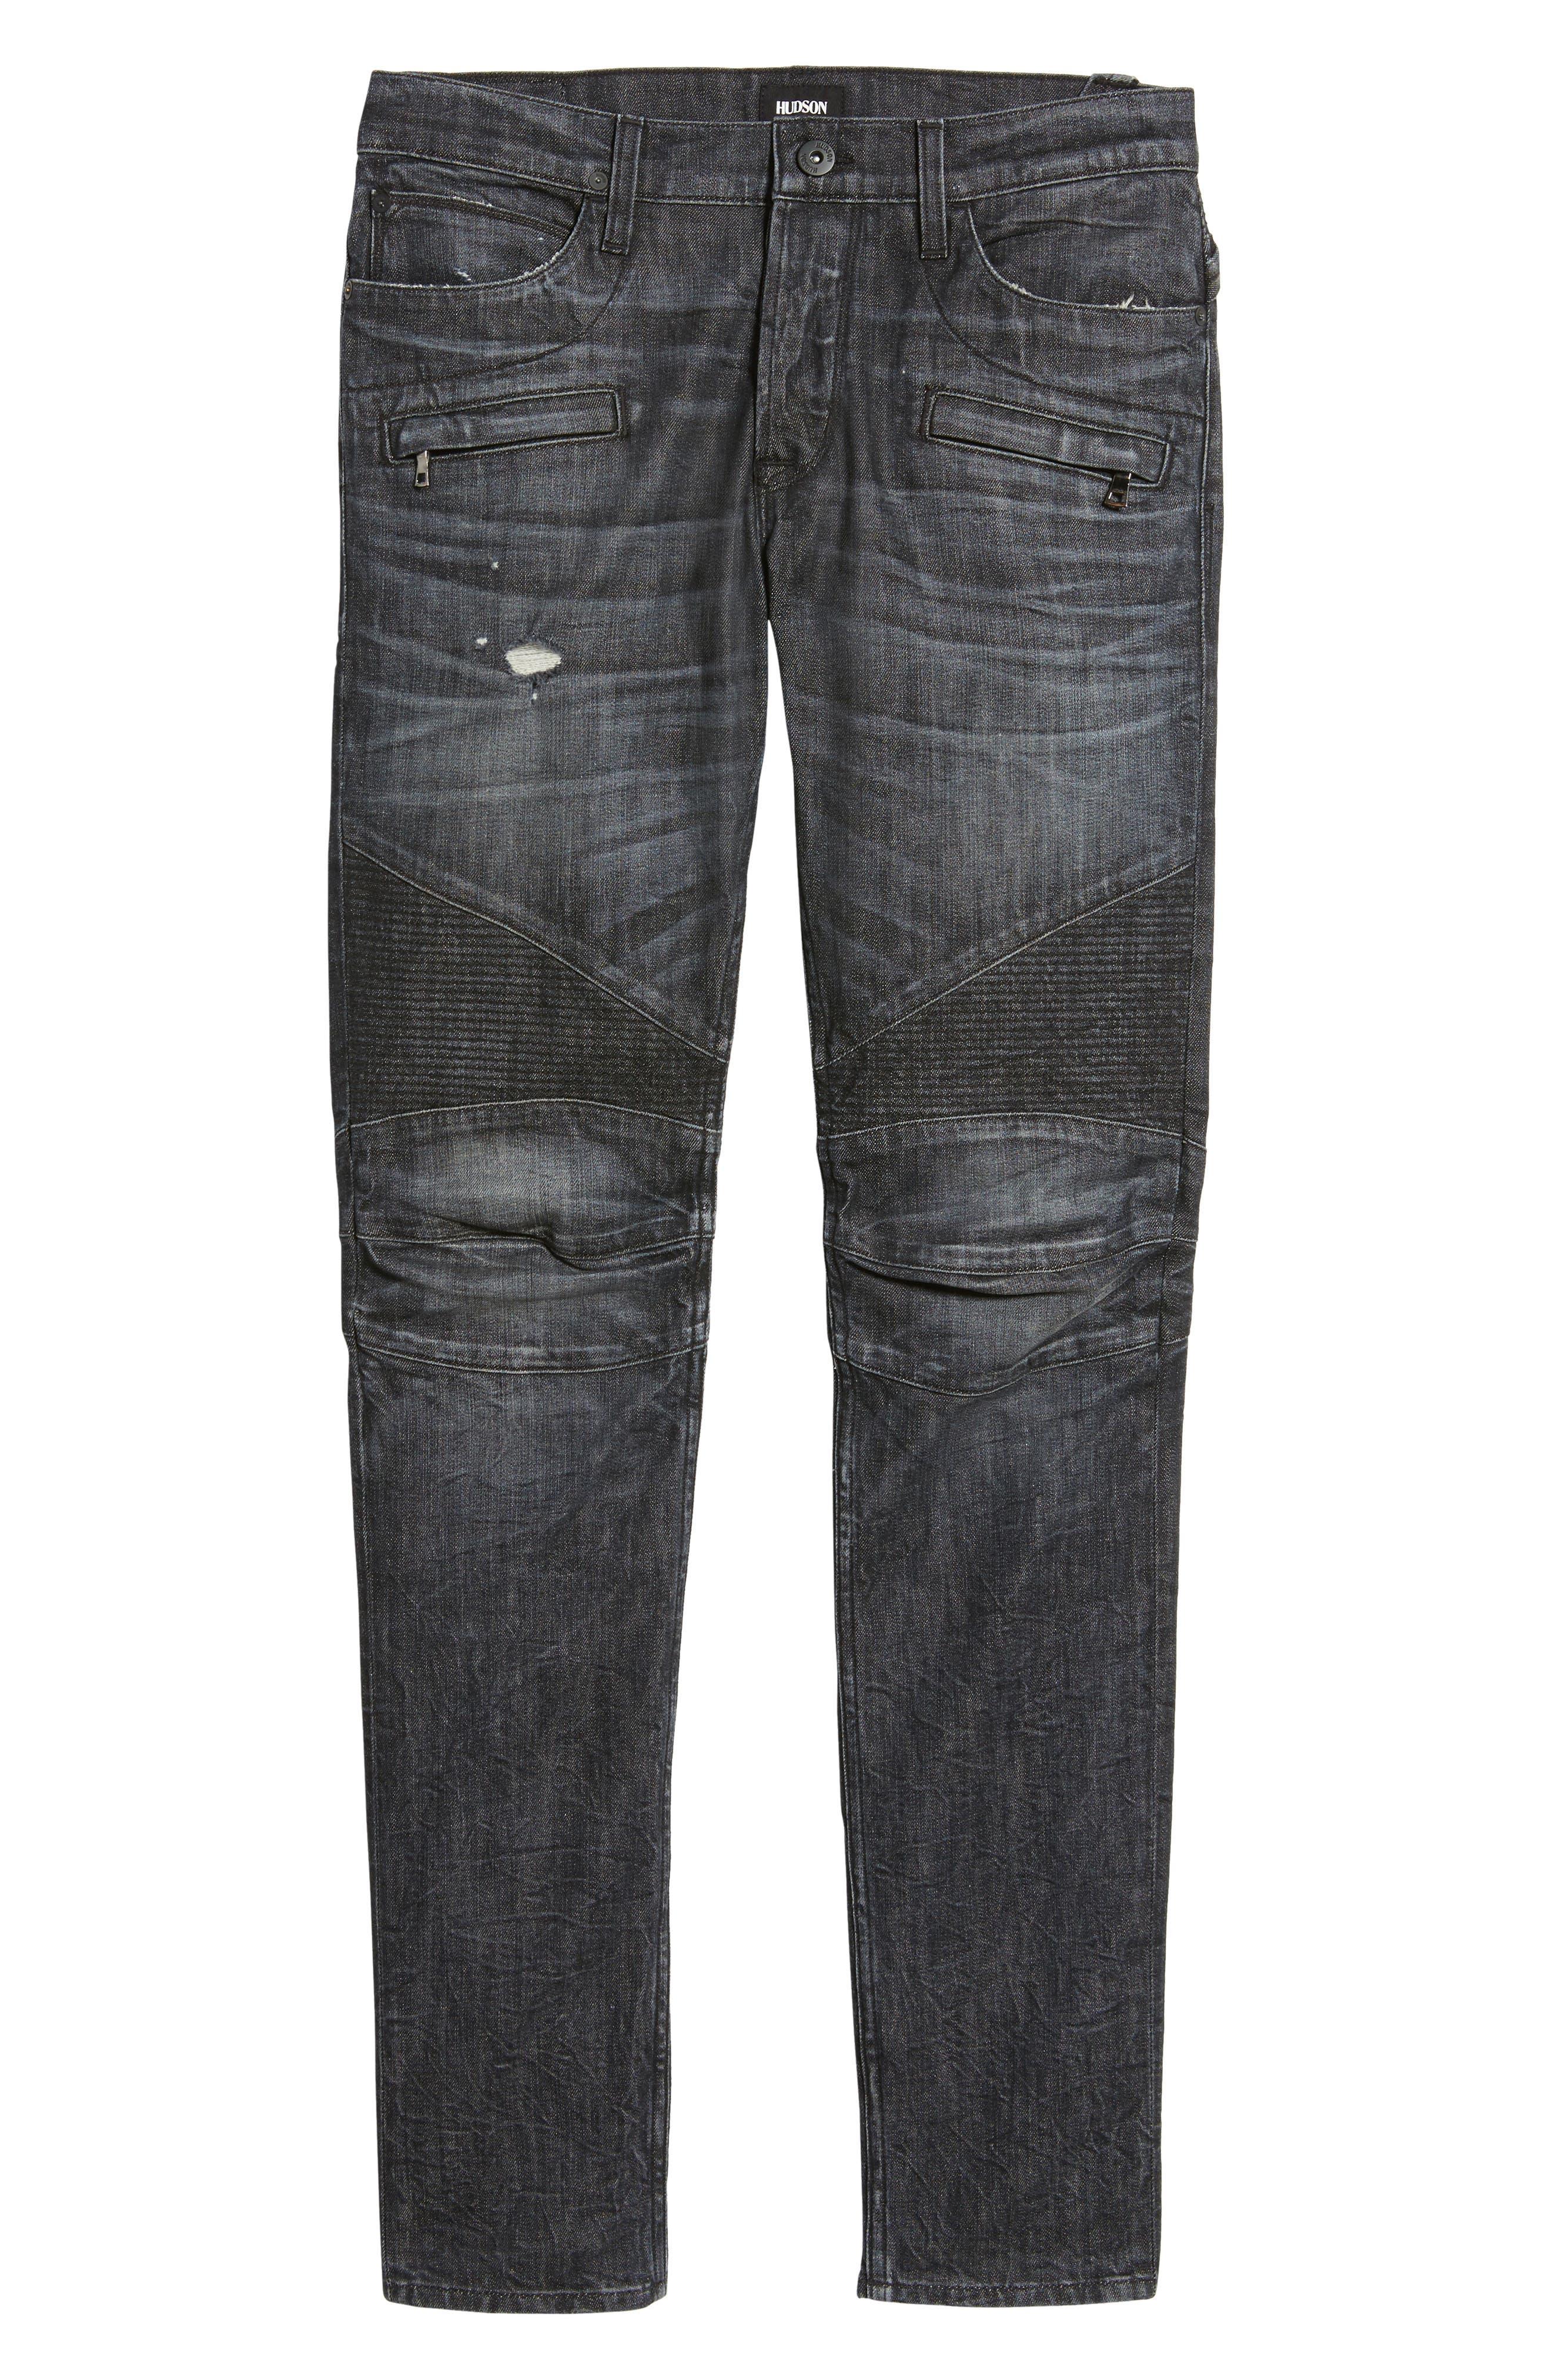 Blinder Biker Moto Skinny Fit Jeans,                             Alternate thumbnail 6, color,                             021